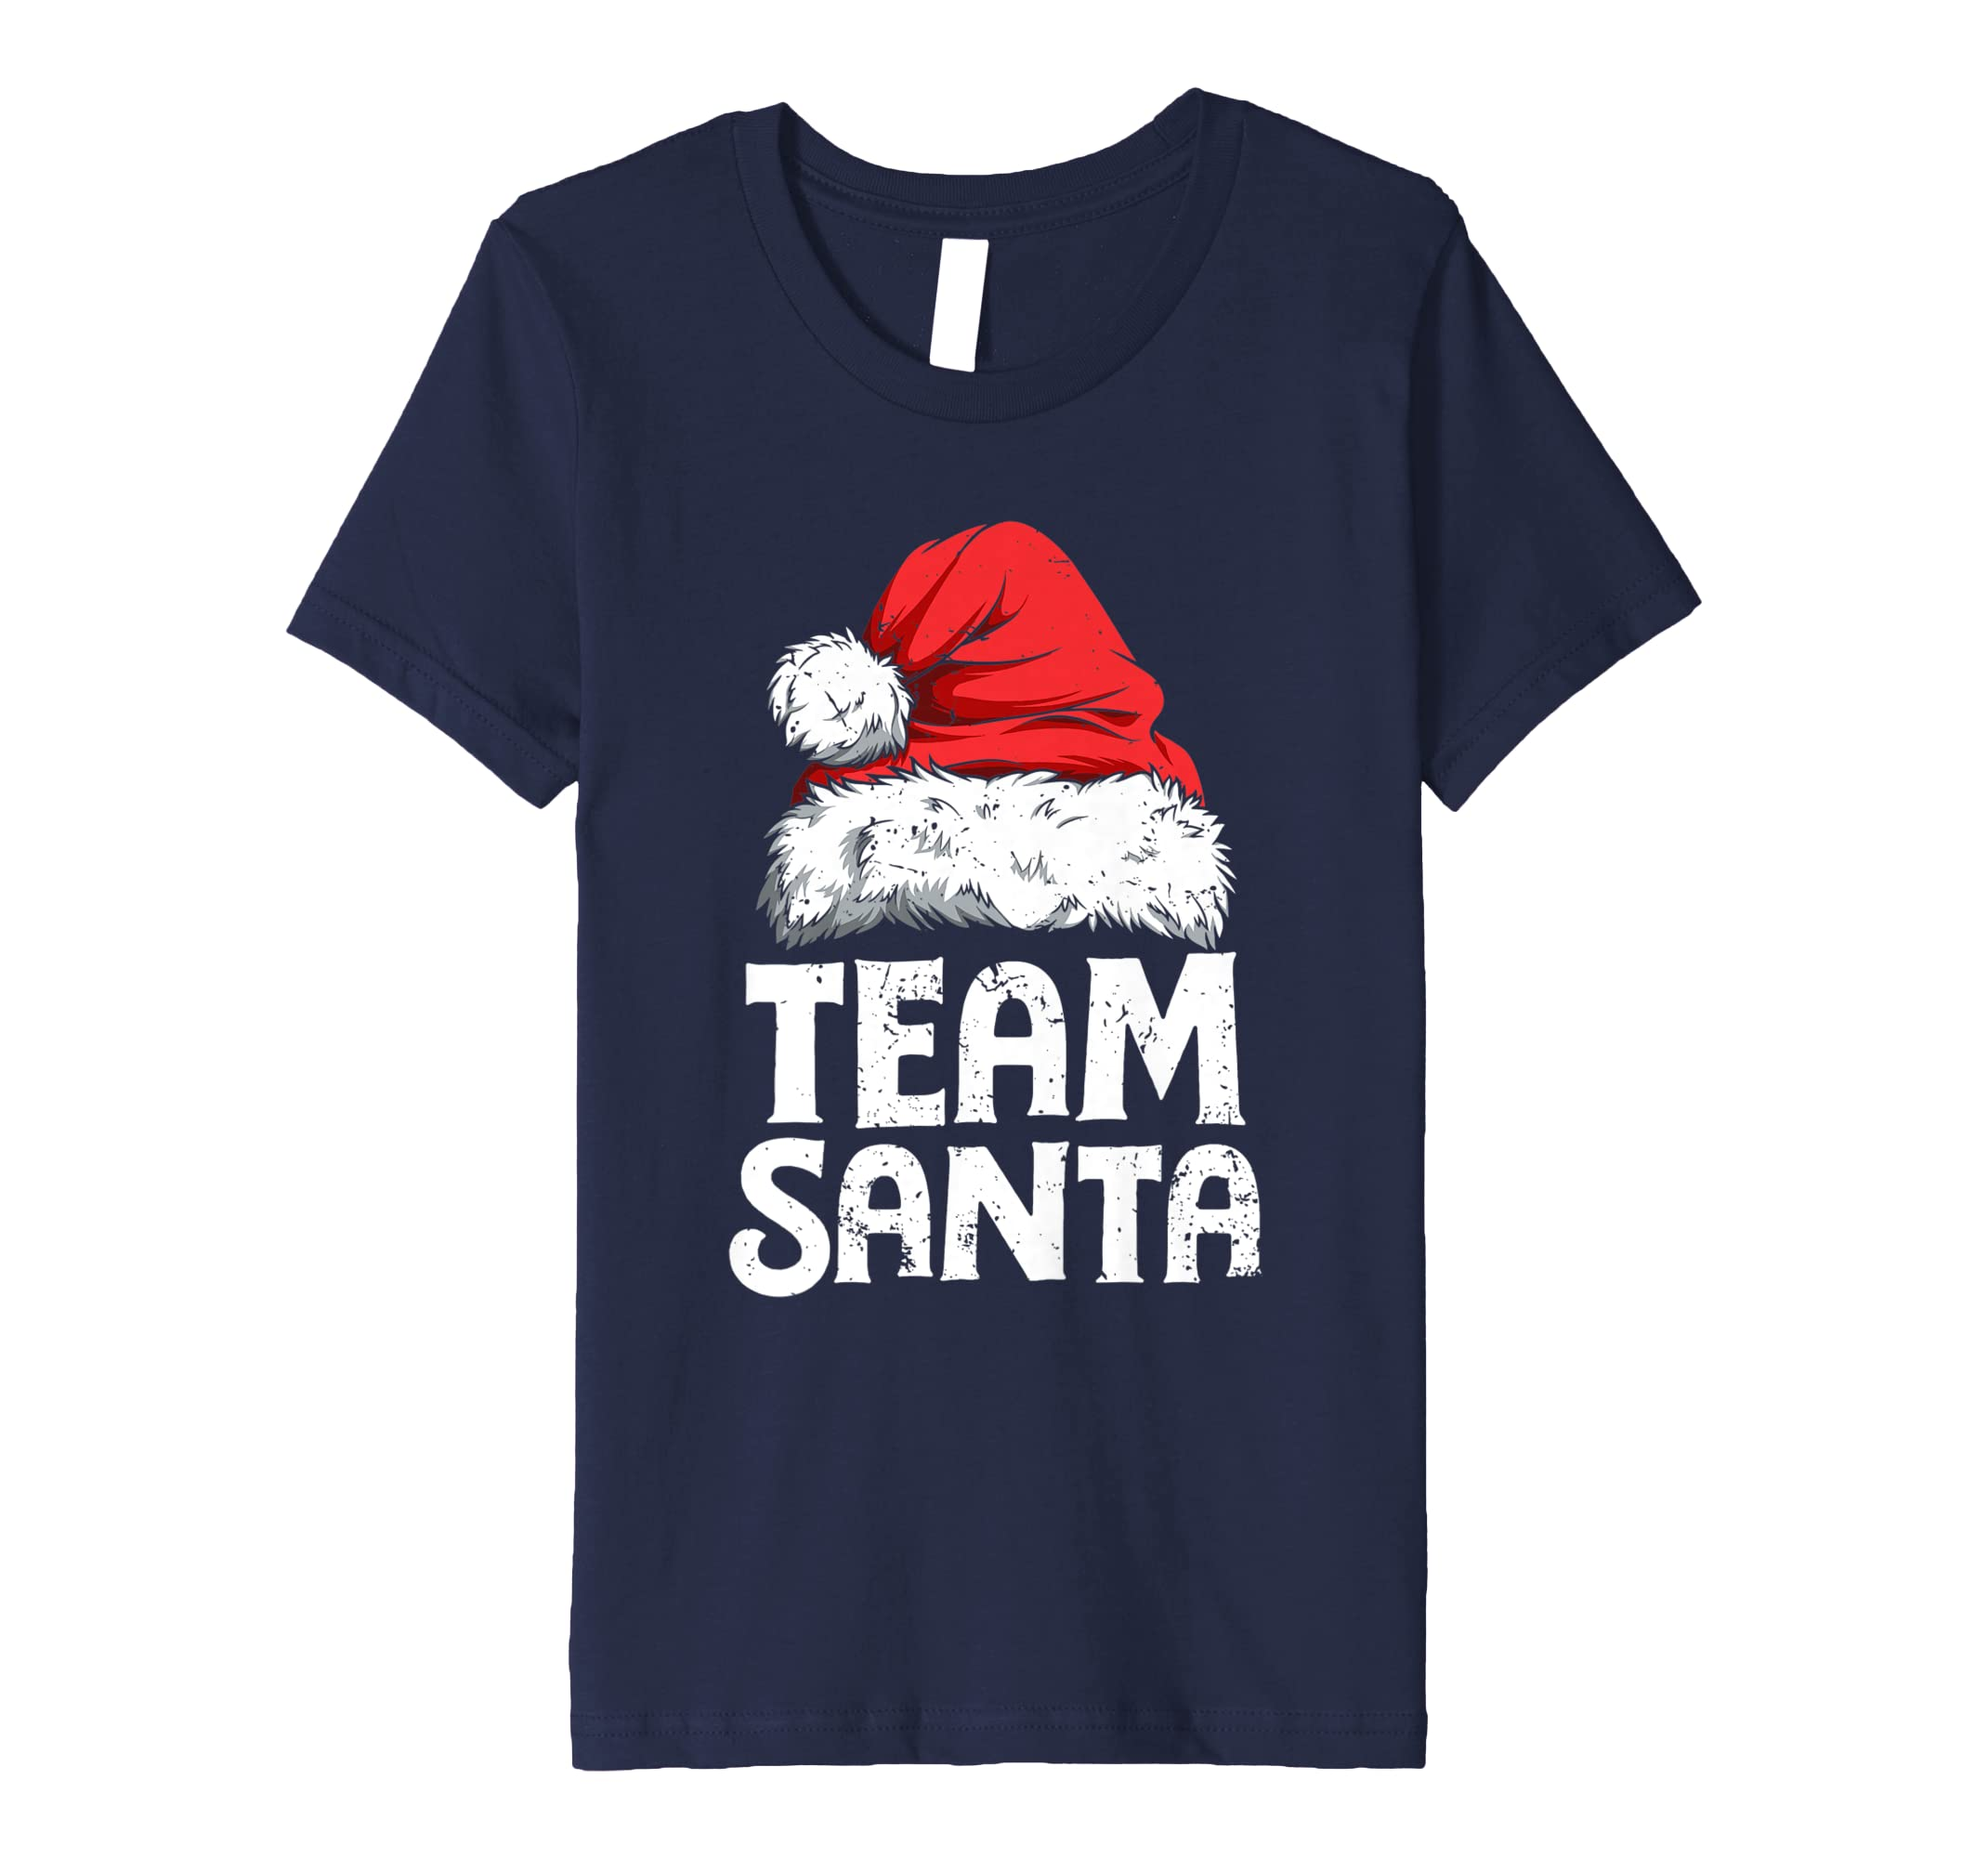 f297edfe82 Amazon.com  Team Santa T shirt Christmas Family Matching Pajamas Tees   Clothing